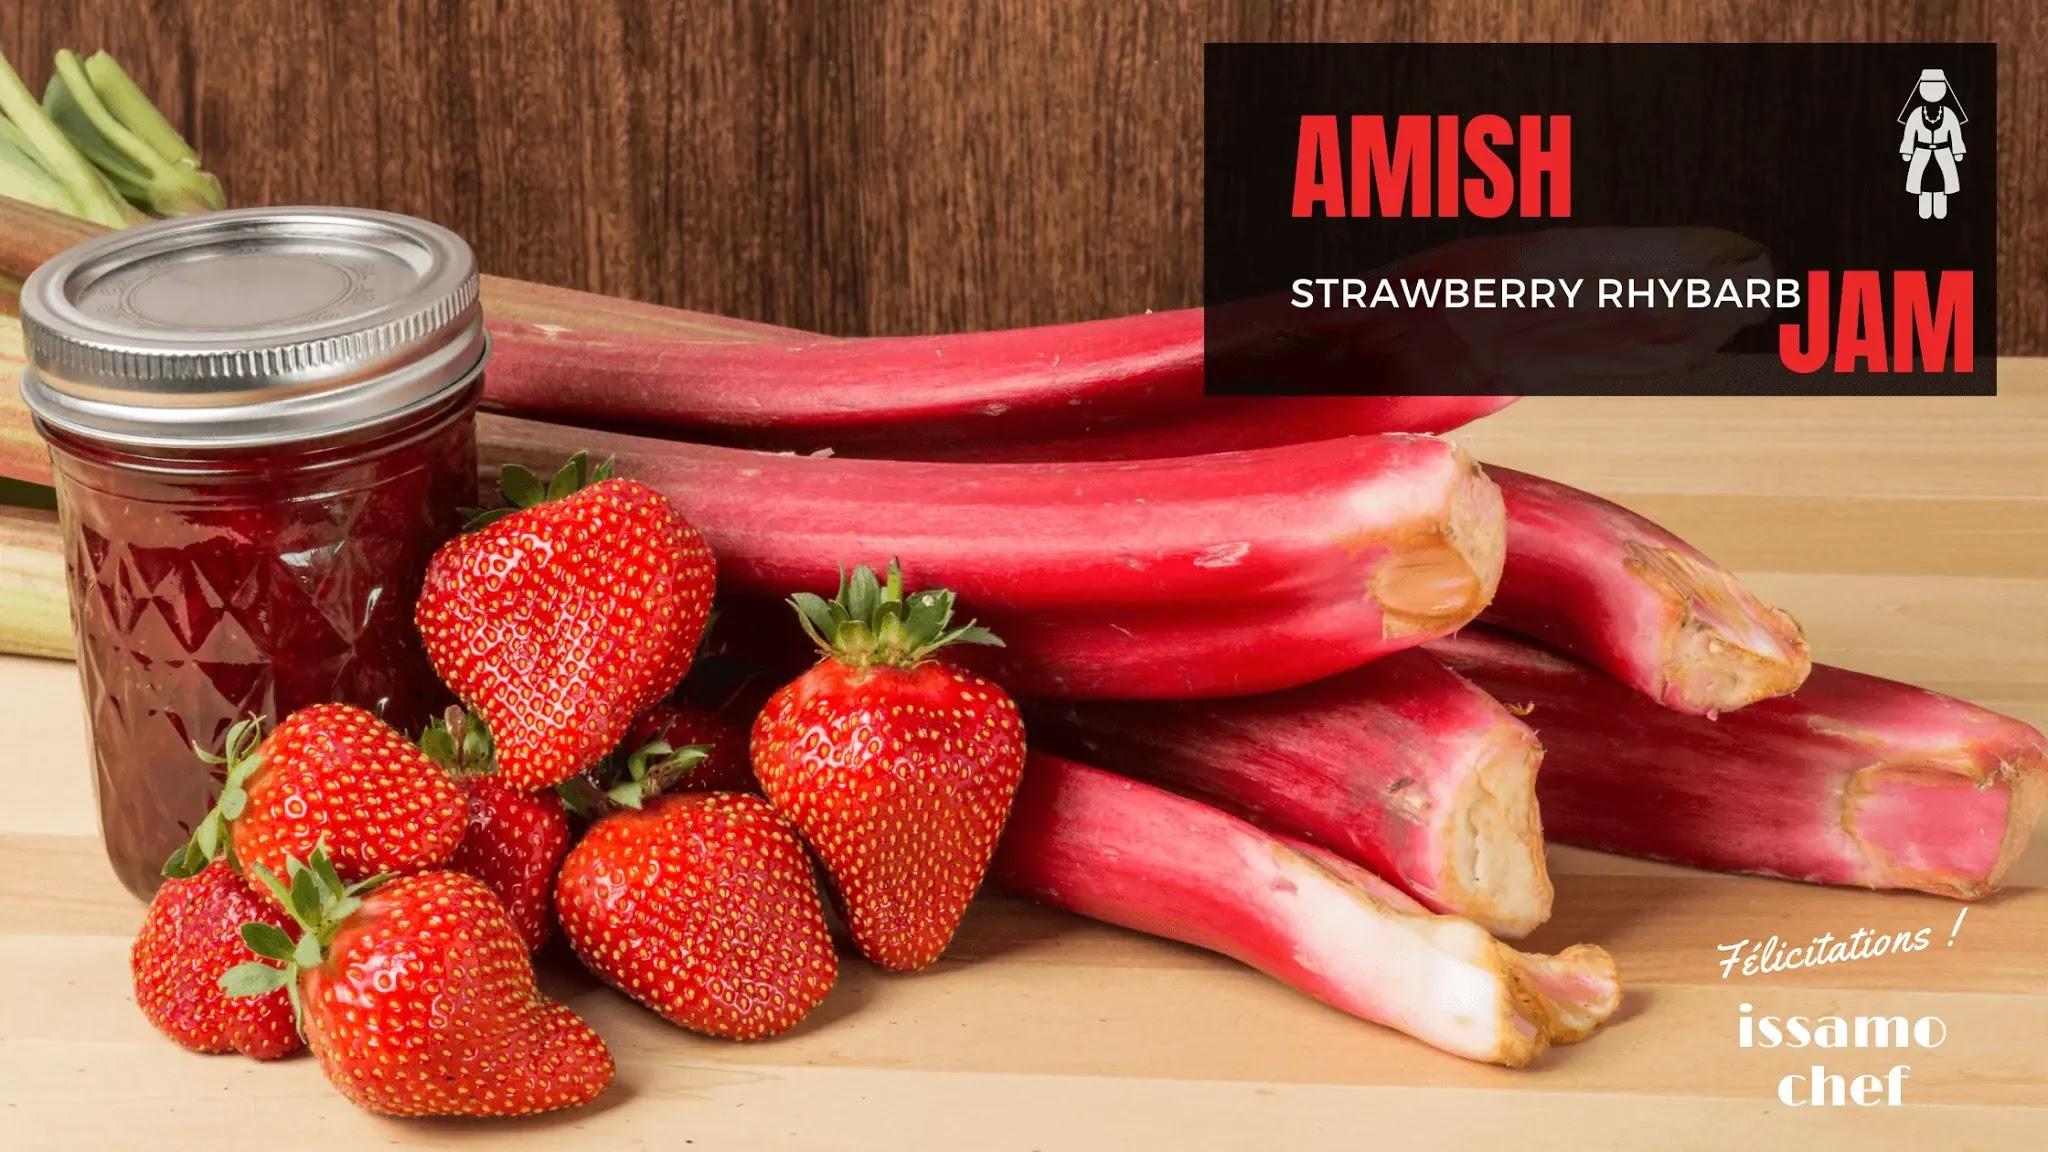 Strawberry kernels, rhubarb stalks, and jam jar